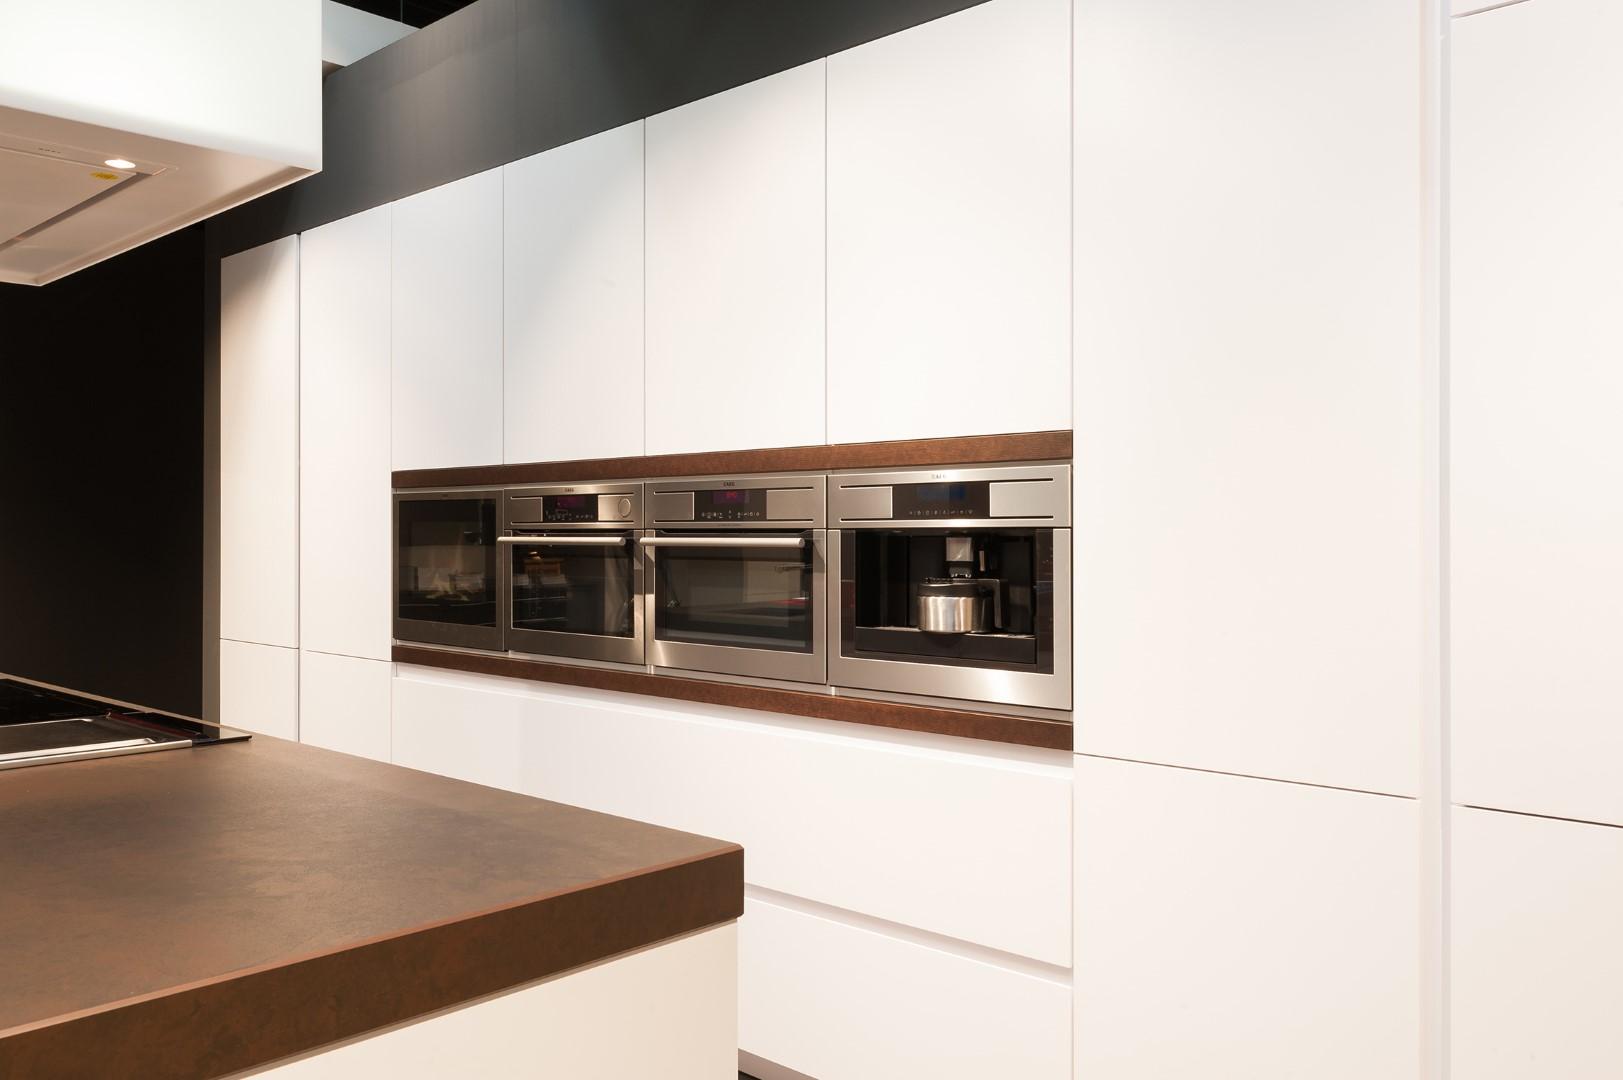 Moderne keuken realisaties keukens deba meubelen deba meubelen - Fotos van moderne keuken ...